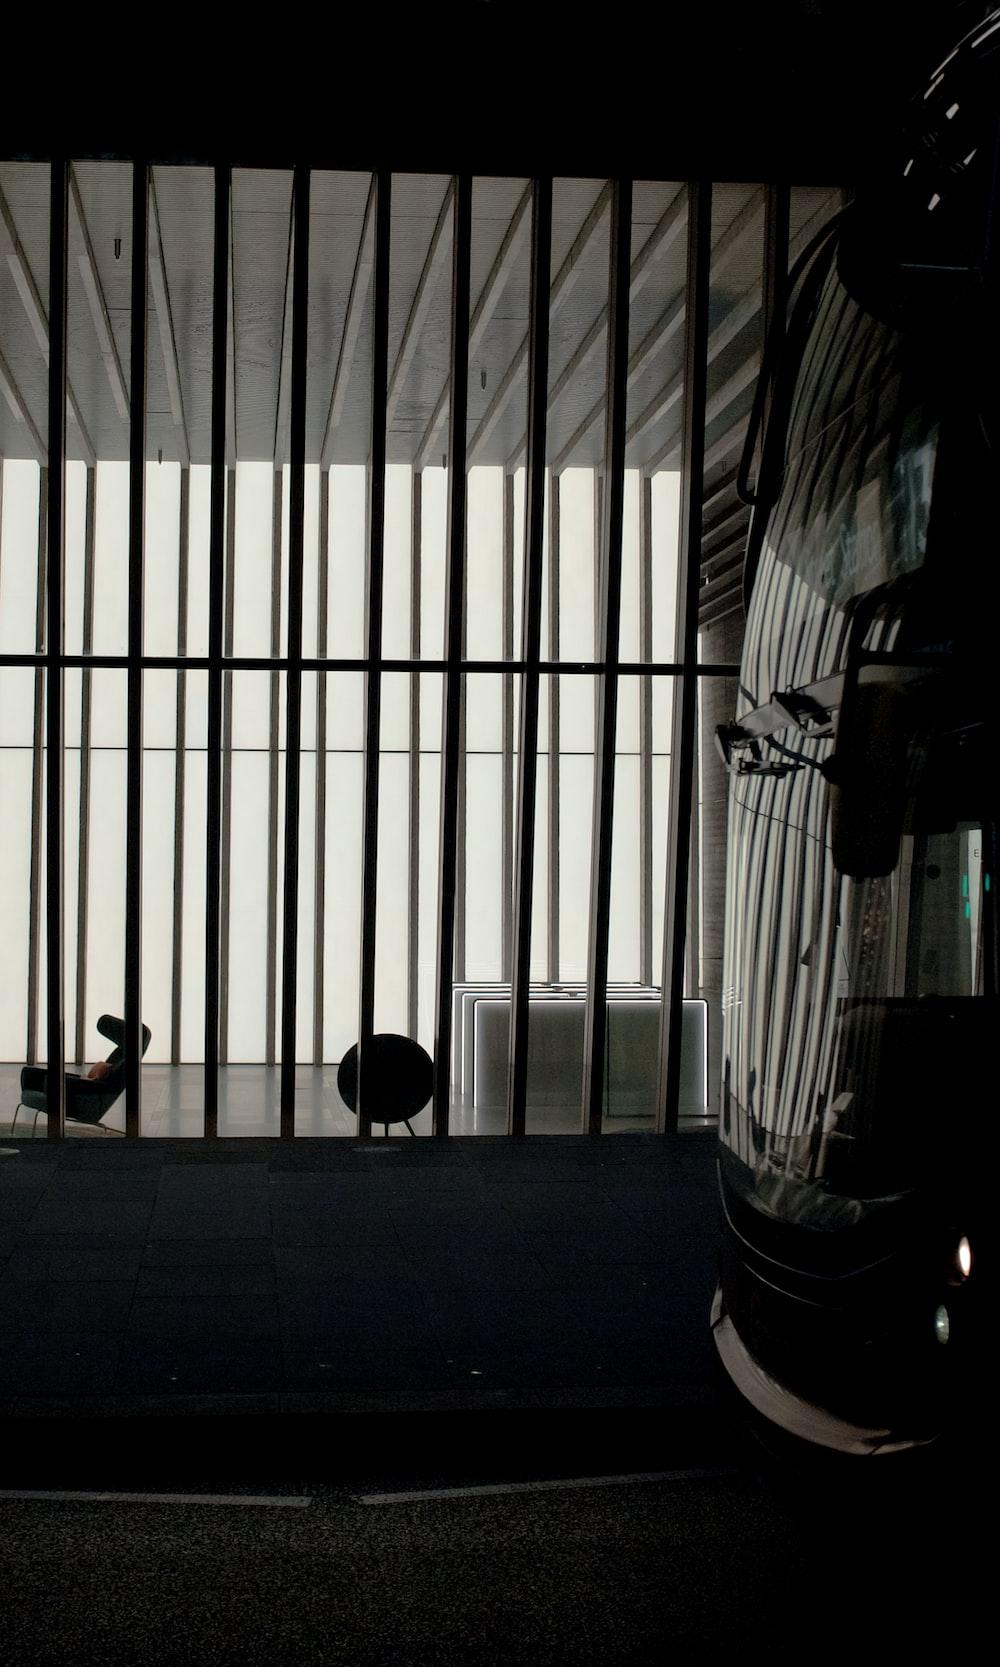 black metal pet cage near white window blinds